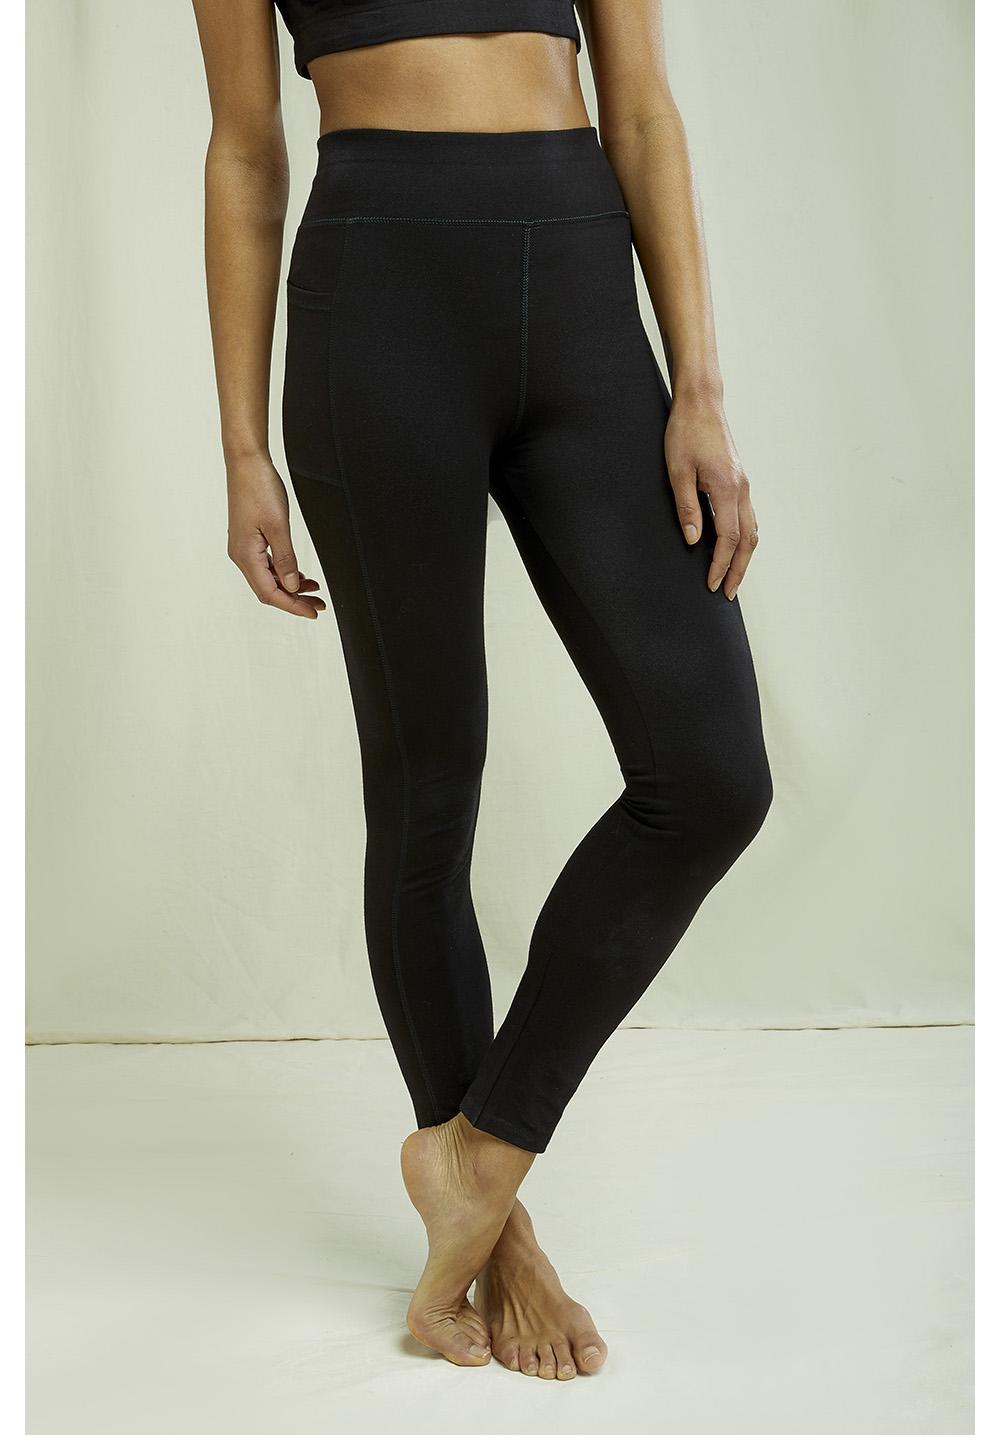 Yoga Pocket Leggings 8